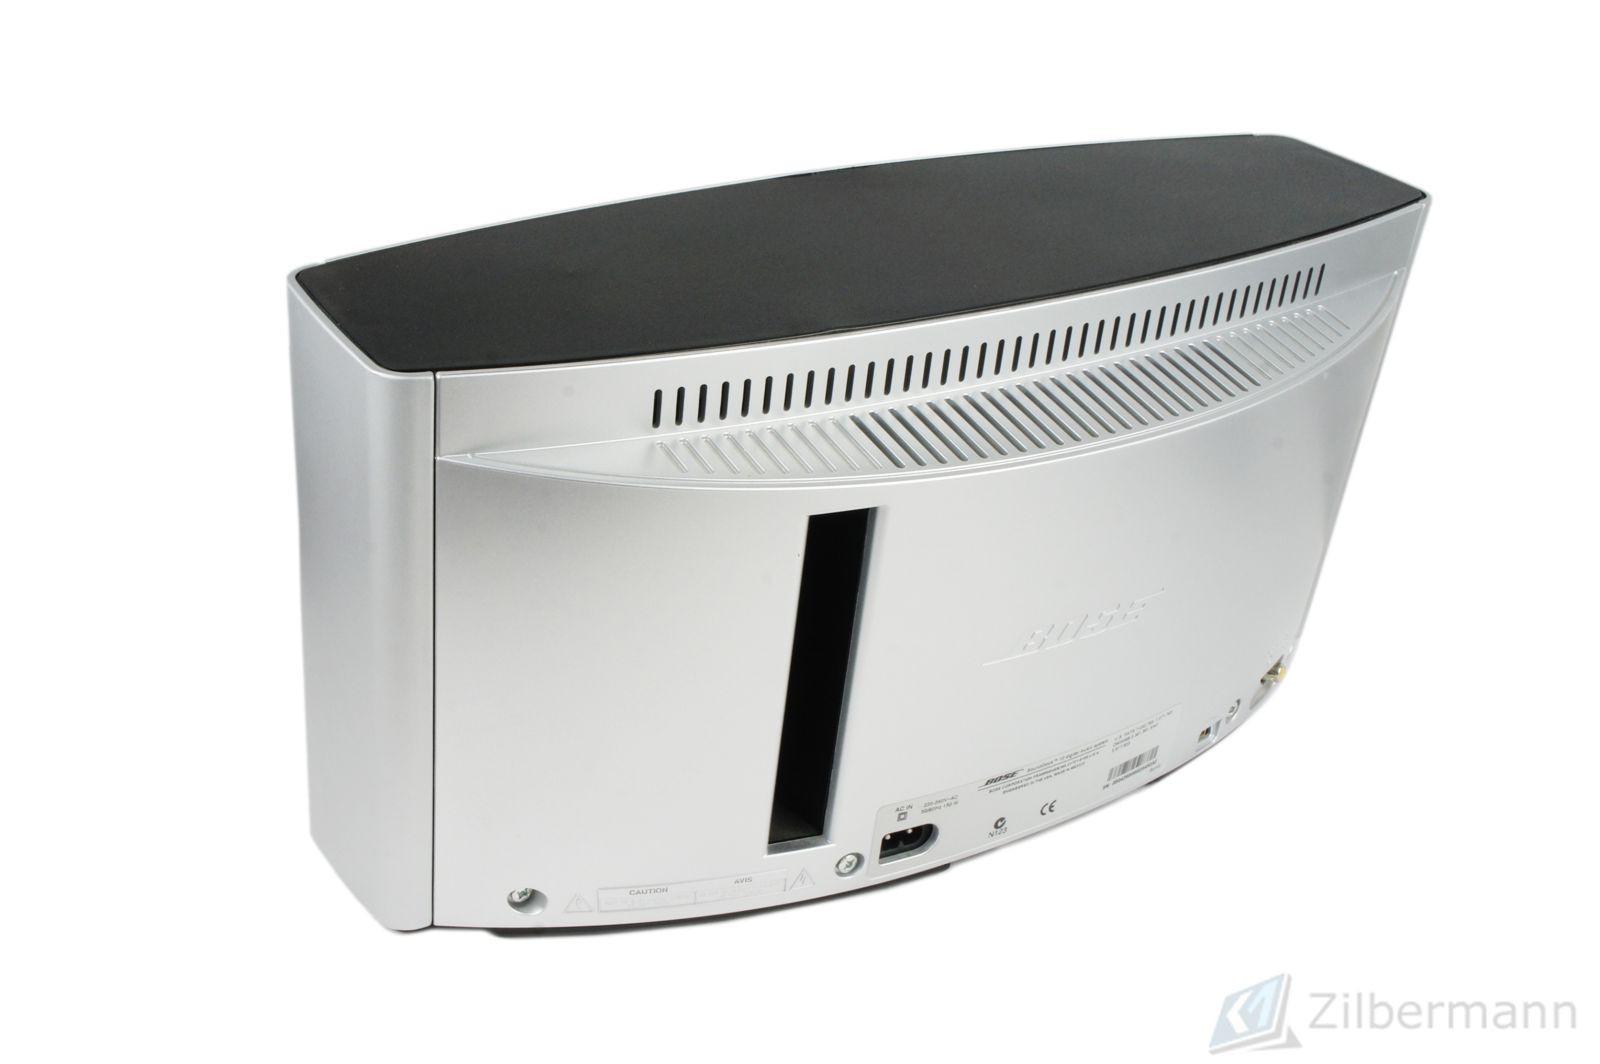 Bose SoundDock 10 Digital Music System 03 - Ebay Shop